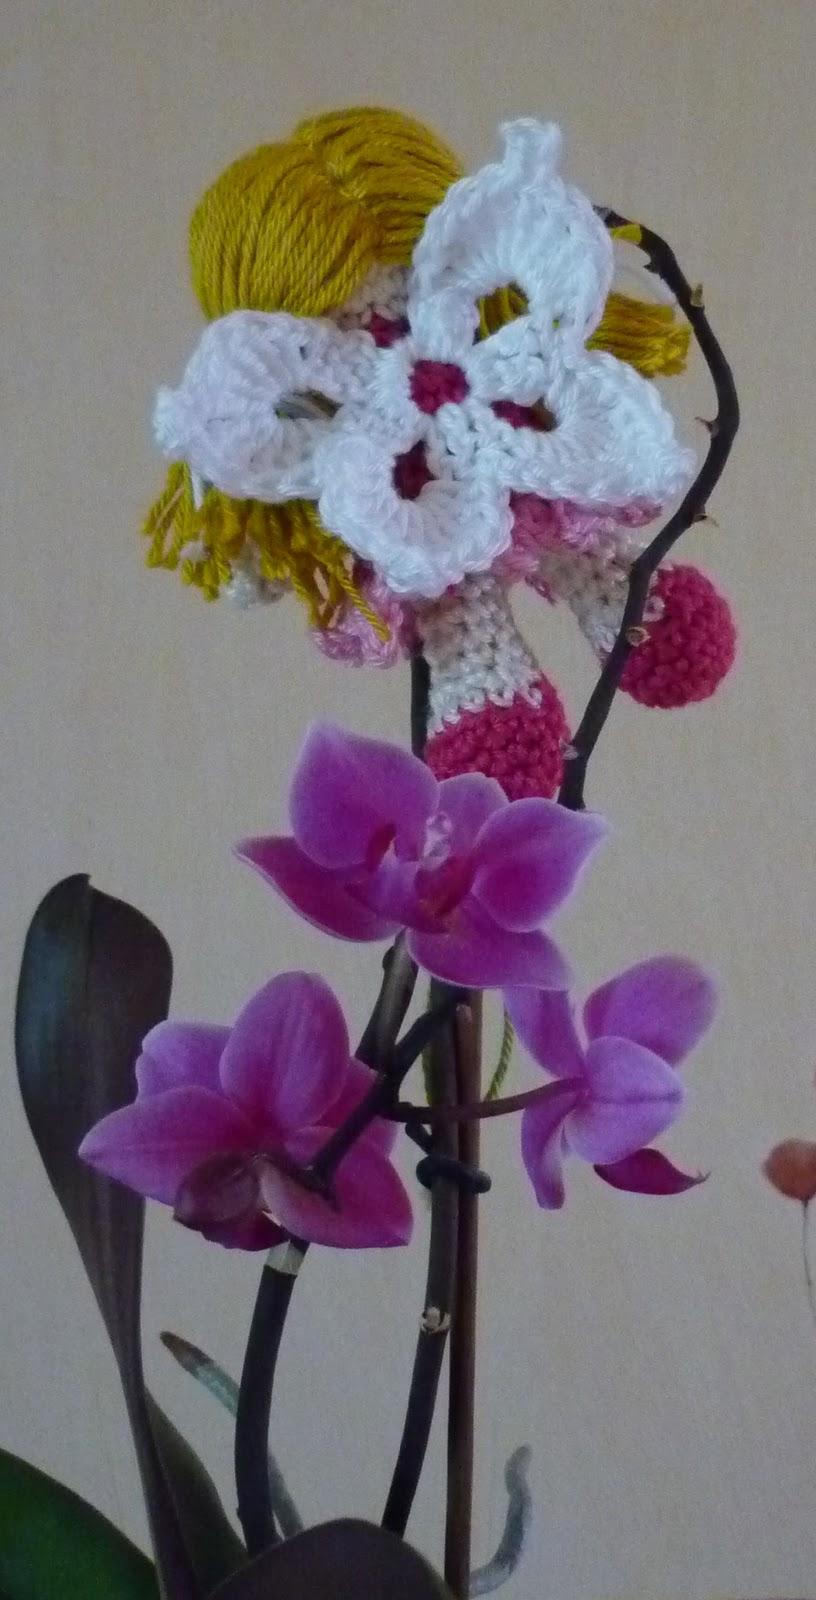 Free Amigurumi Fairy Pattern : 2000 Free Amigurumi Patterns: Little Fairy for free download